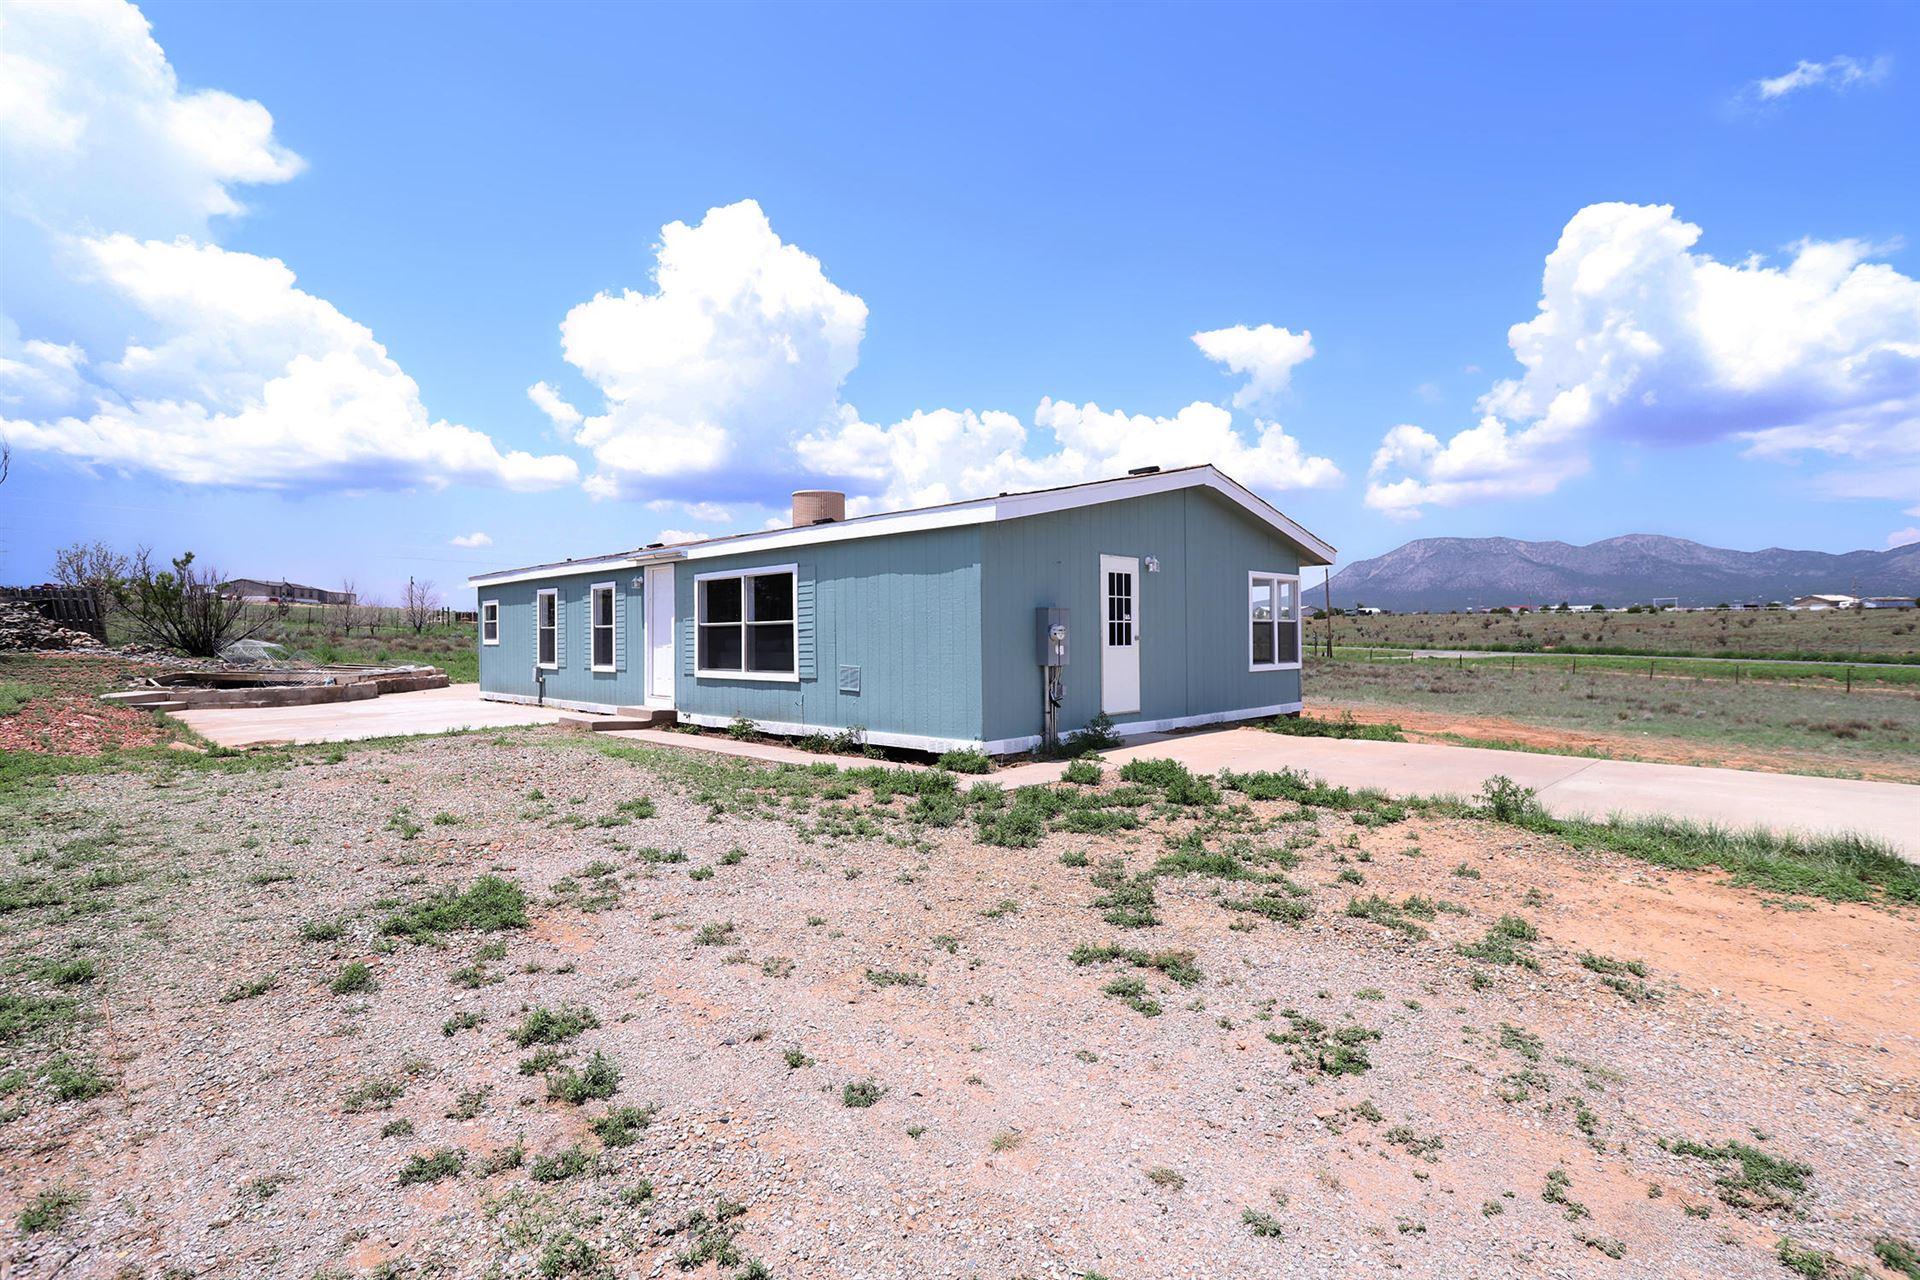 Photo for 3 Windgate Road, Edgewood, NM 87015 (MLS # 997064)